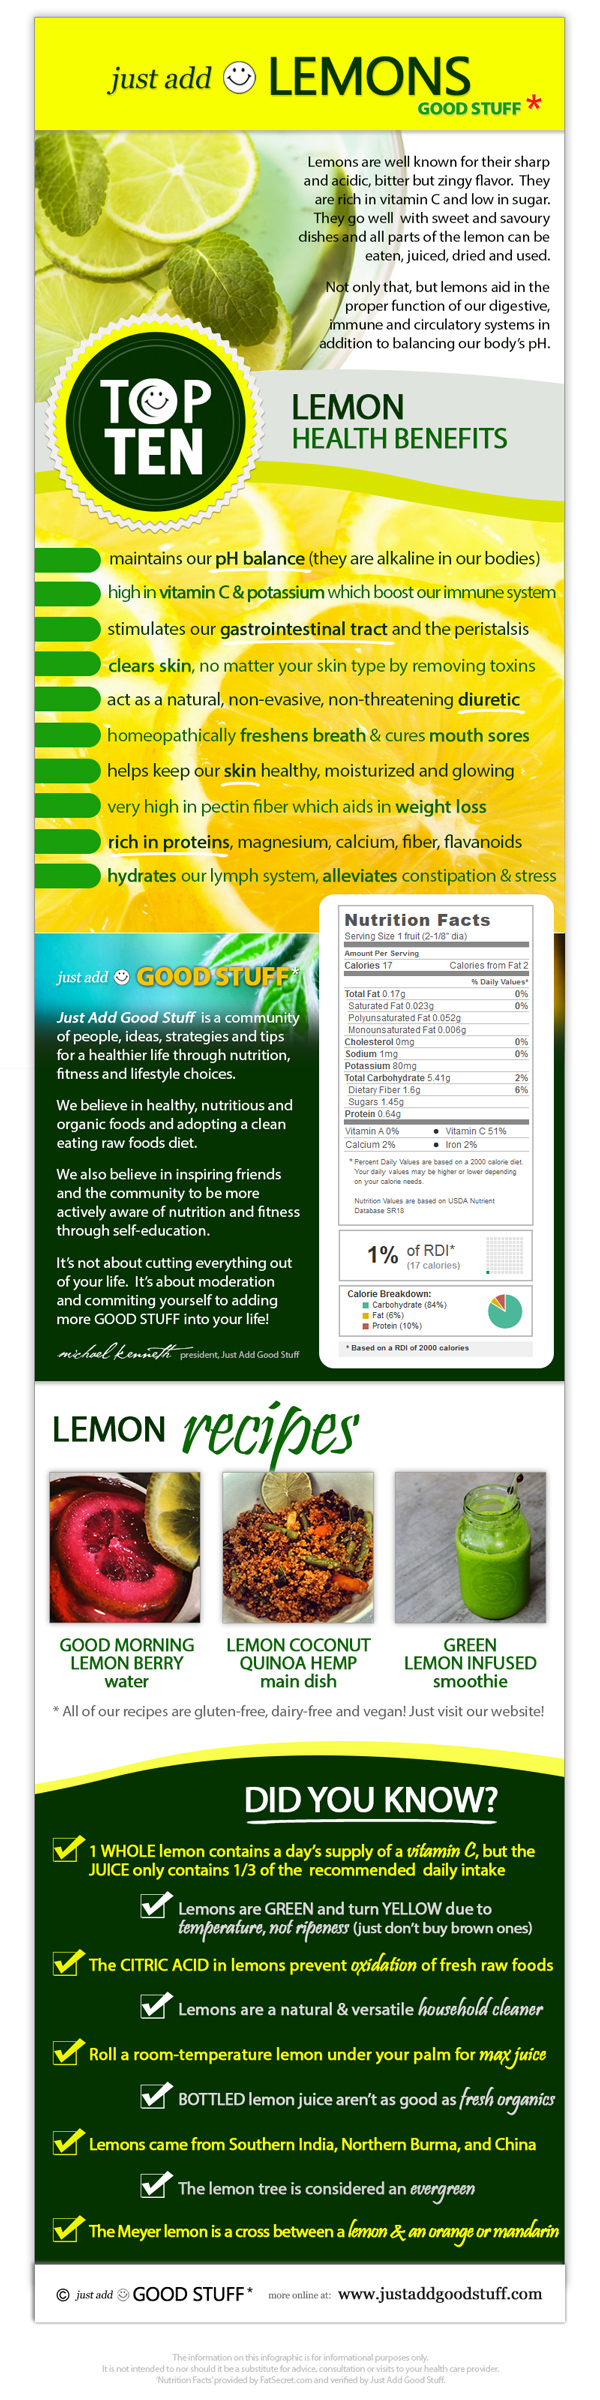 Interesting Benefits to Lemons